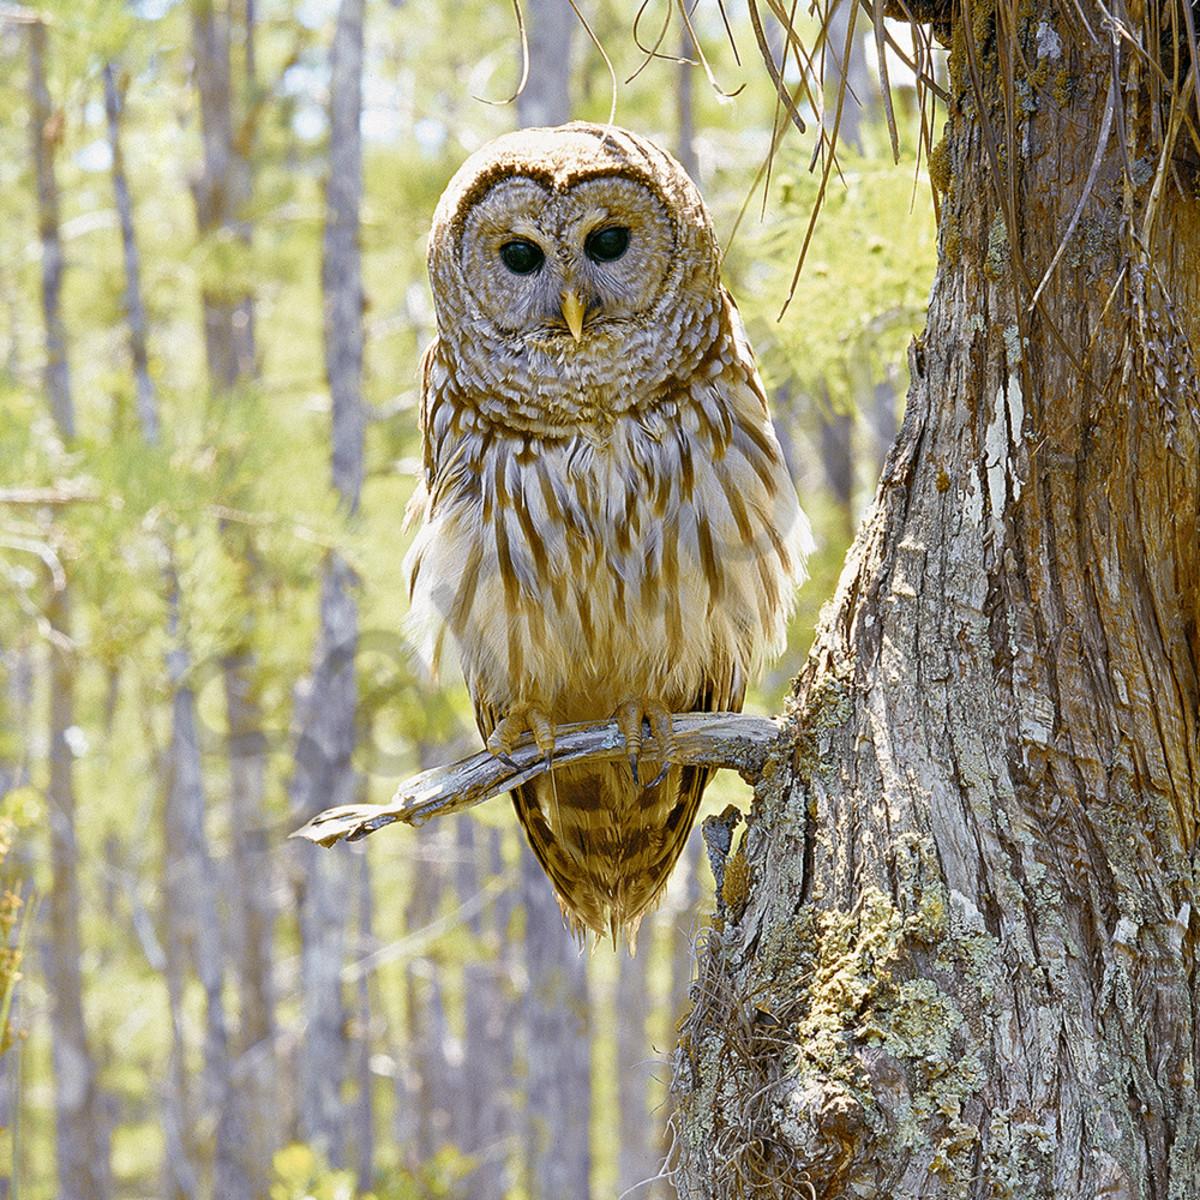 Barred owl wydcxu